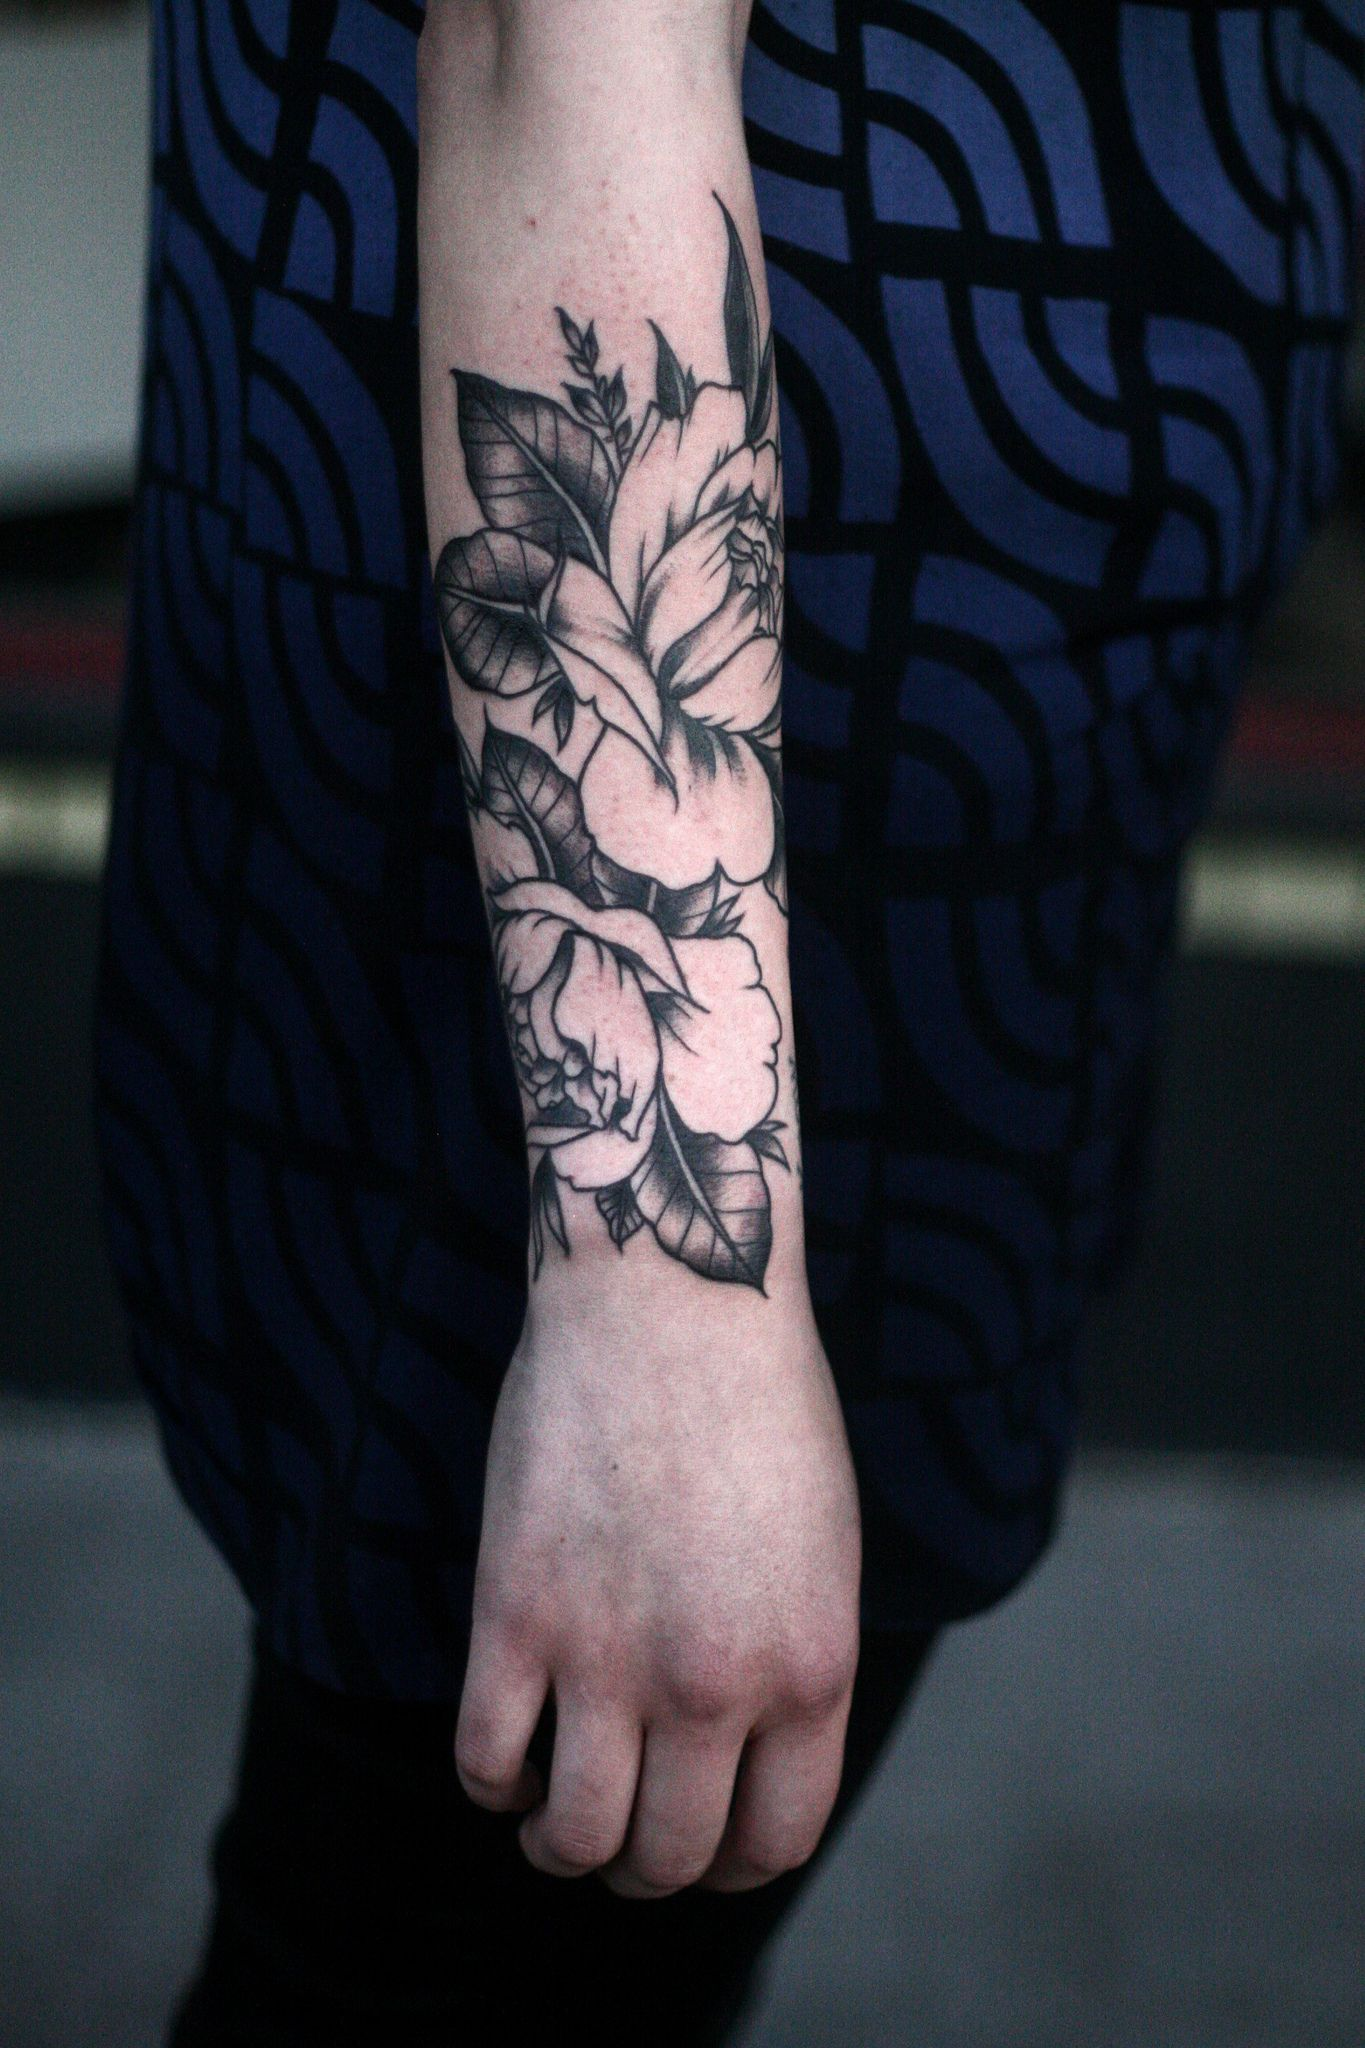 Img3088 Tat Pinterest Tattoo Design Tattoos And Tatoos